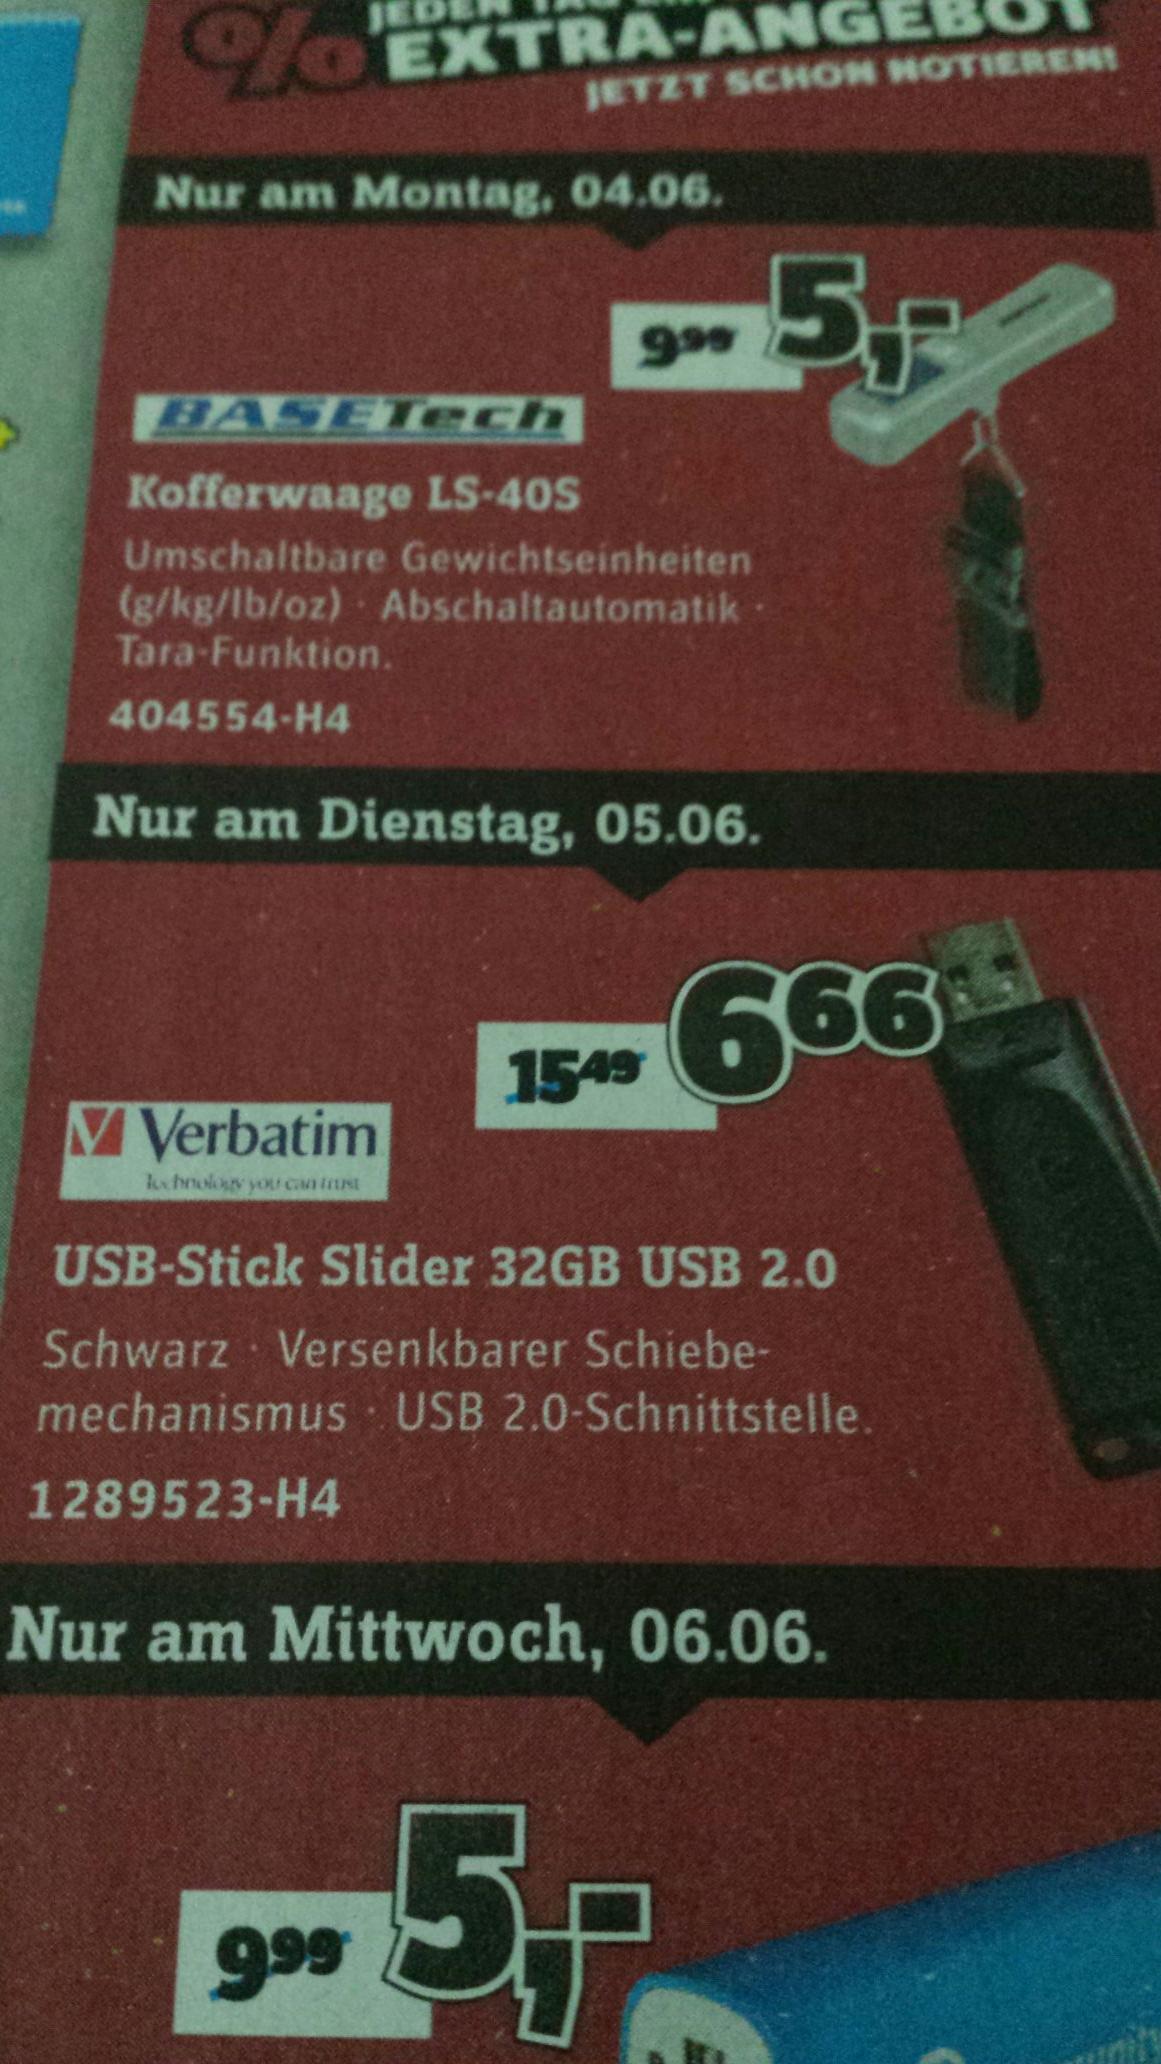 [Conrad Offline ] Verbatim USB Stick Slider 32 GB 2.0